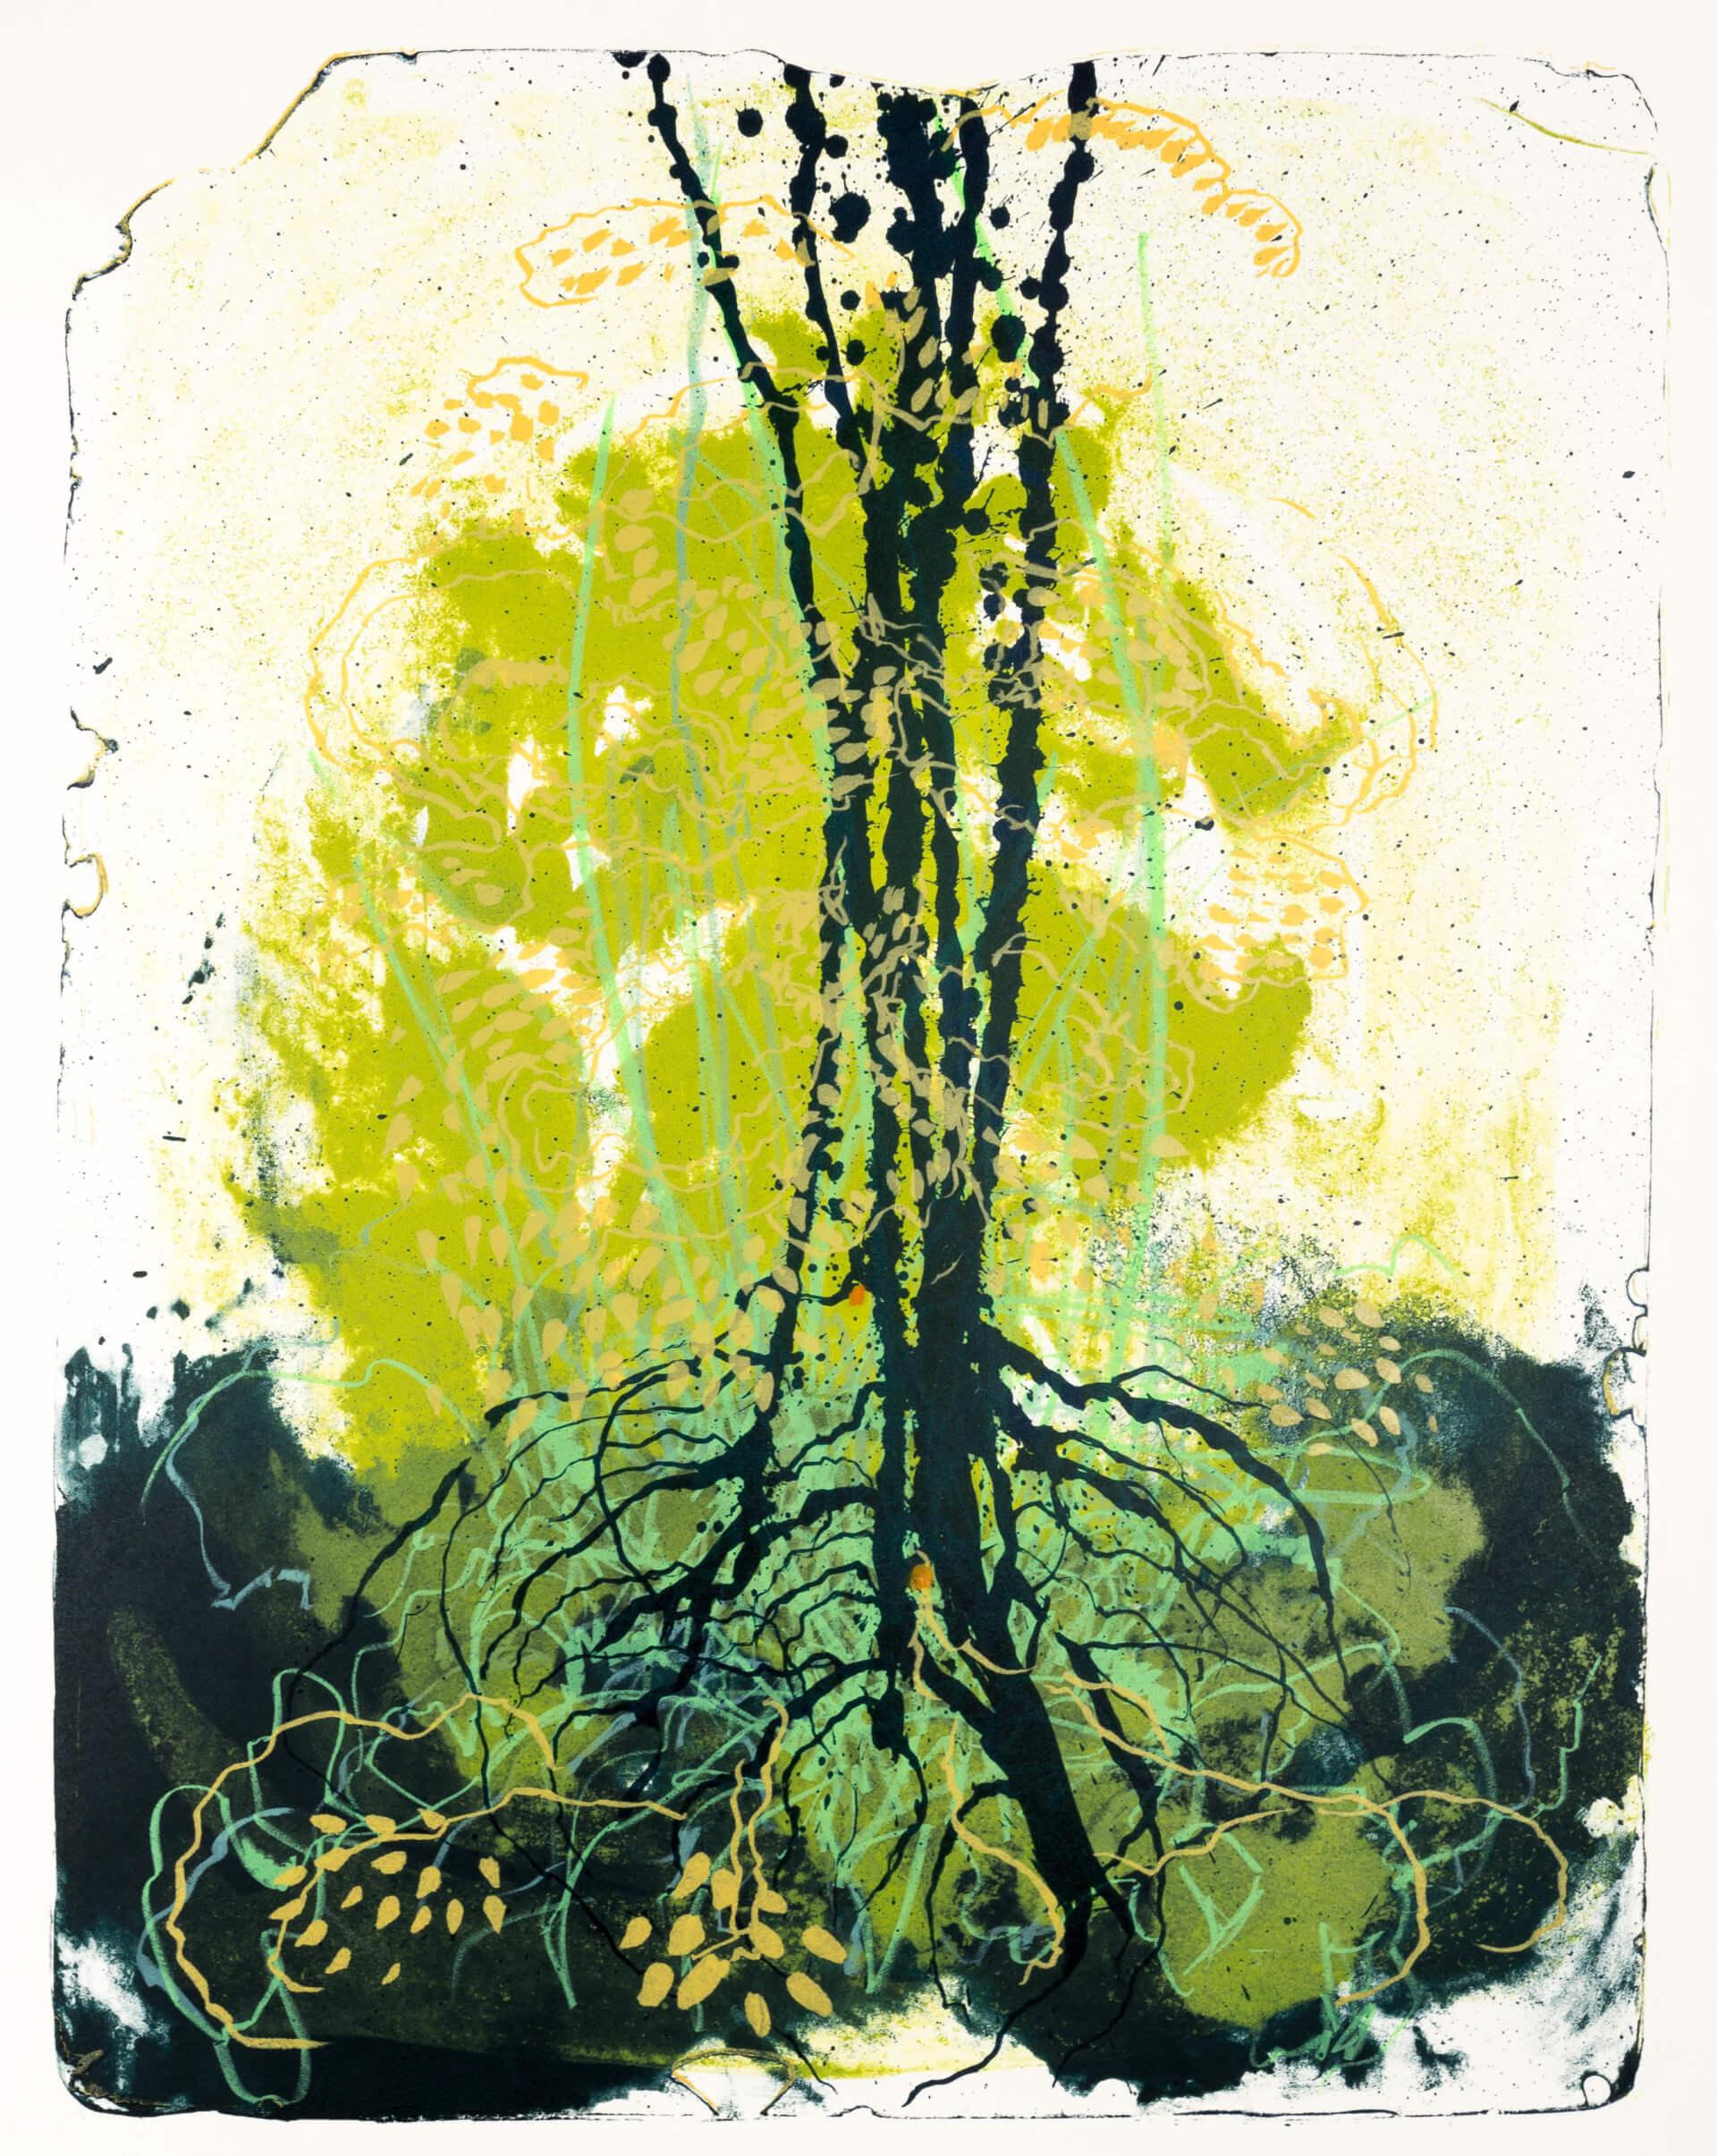 Wald X(D)-II, 2019, Farblithographie, Unikat, 50x40 cm